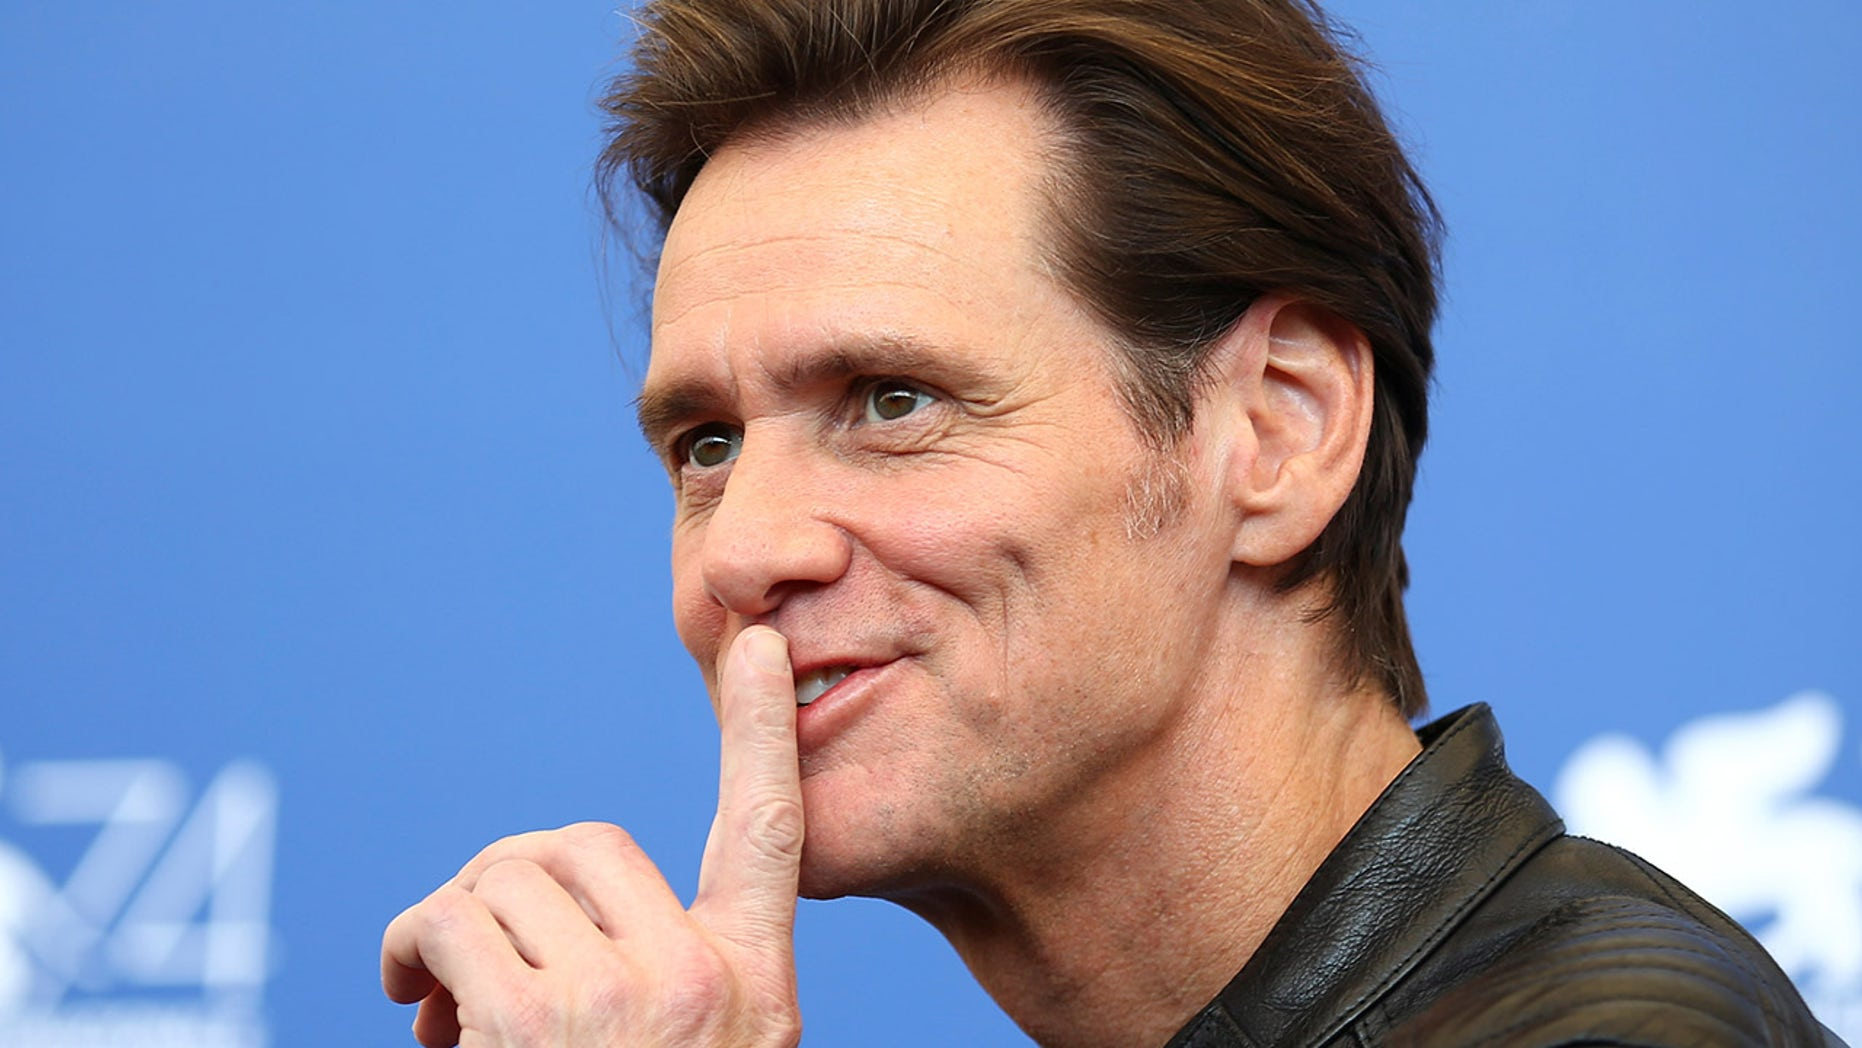 Volochkova announced her love affair with Jim Carrey